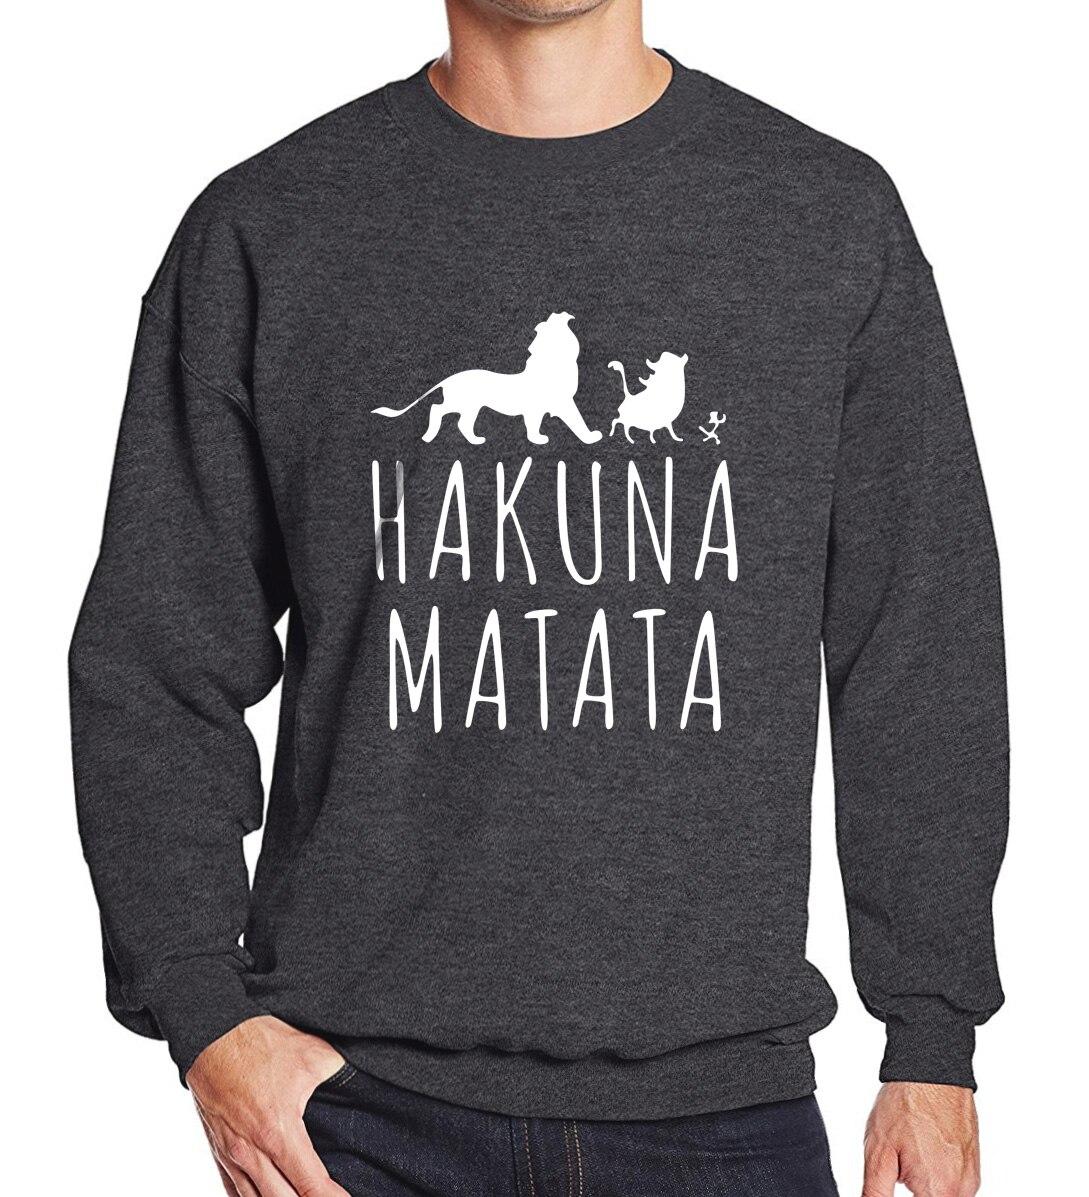 New arrival 2017 spring sweatshirt winter hoody fleece HAKUNA MATATA funny letter print hot men's sportswear hoodies harajuku